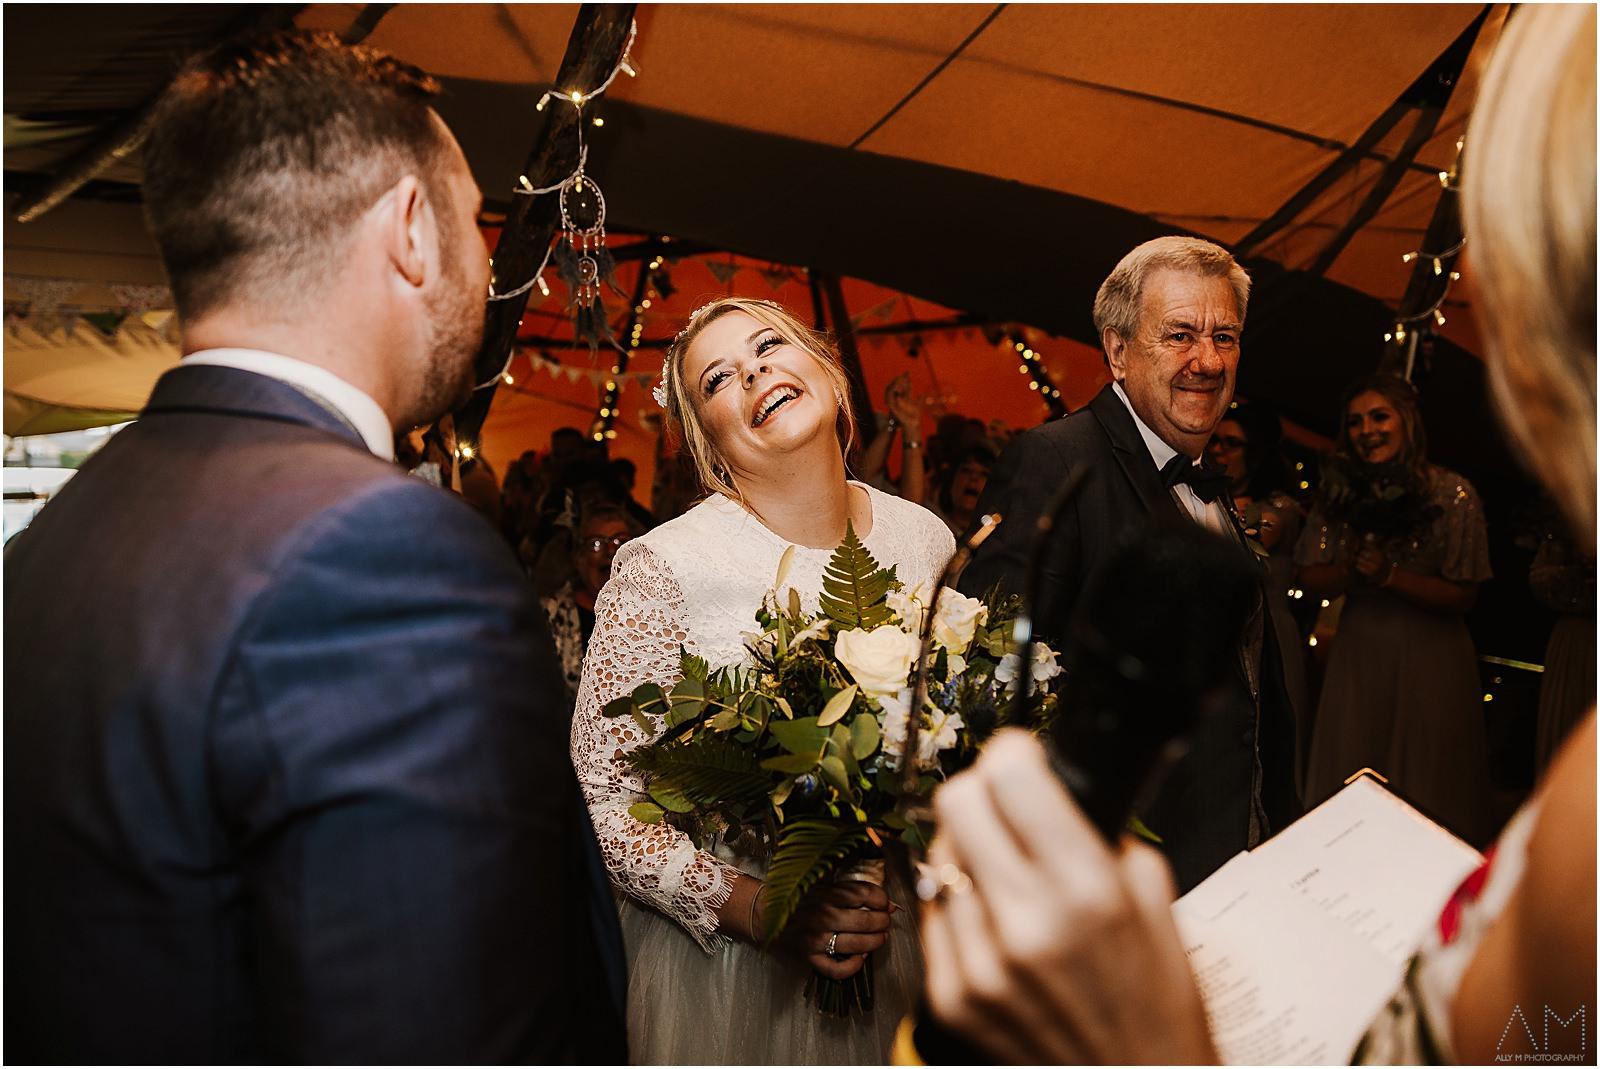 Bride smilng at her man